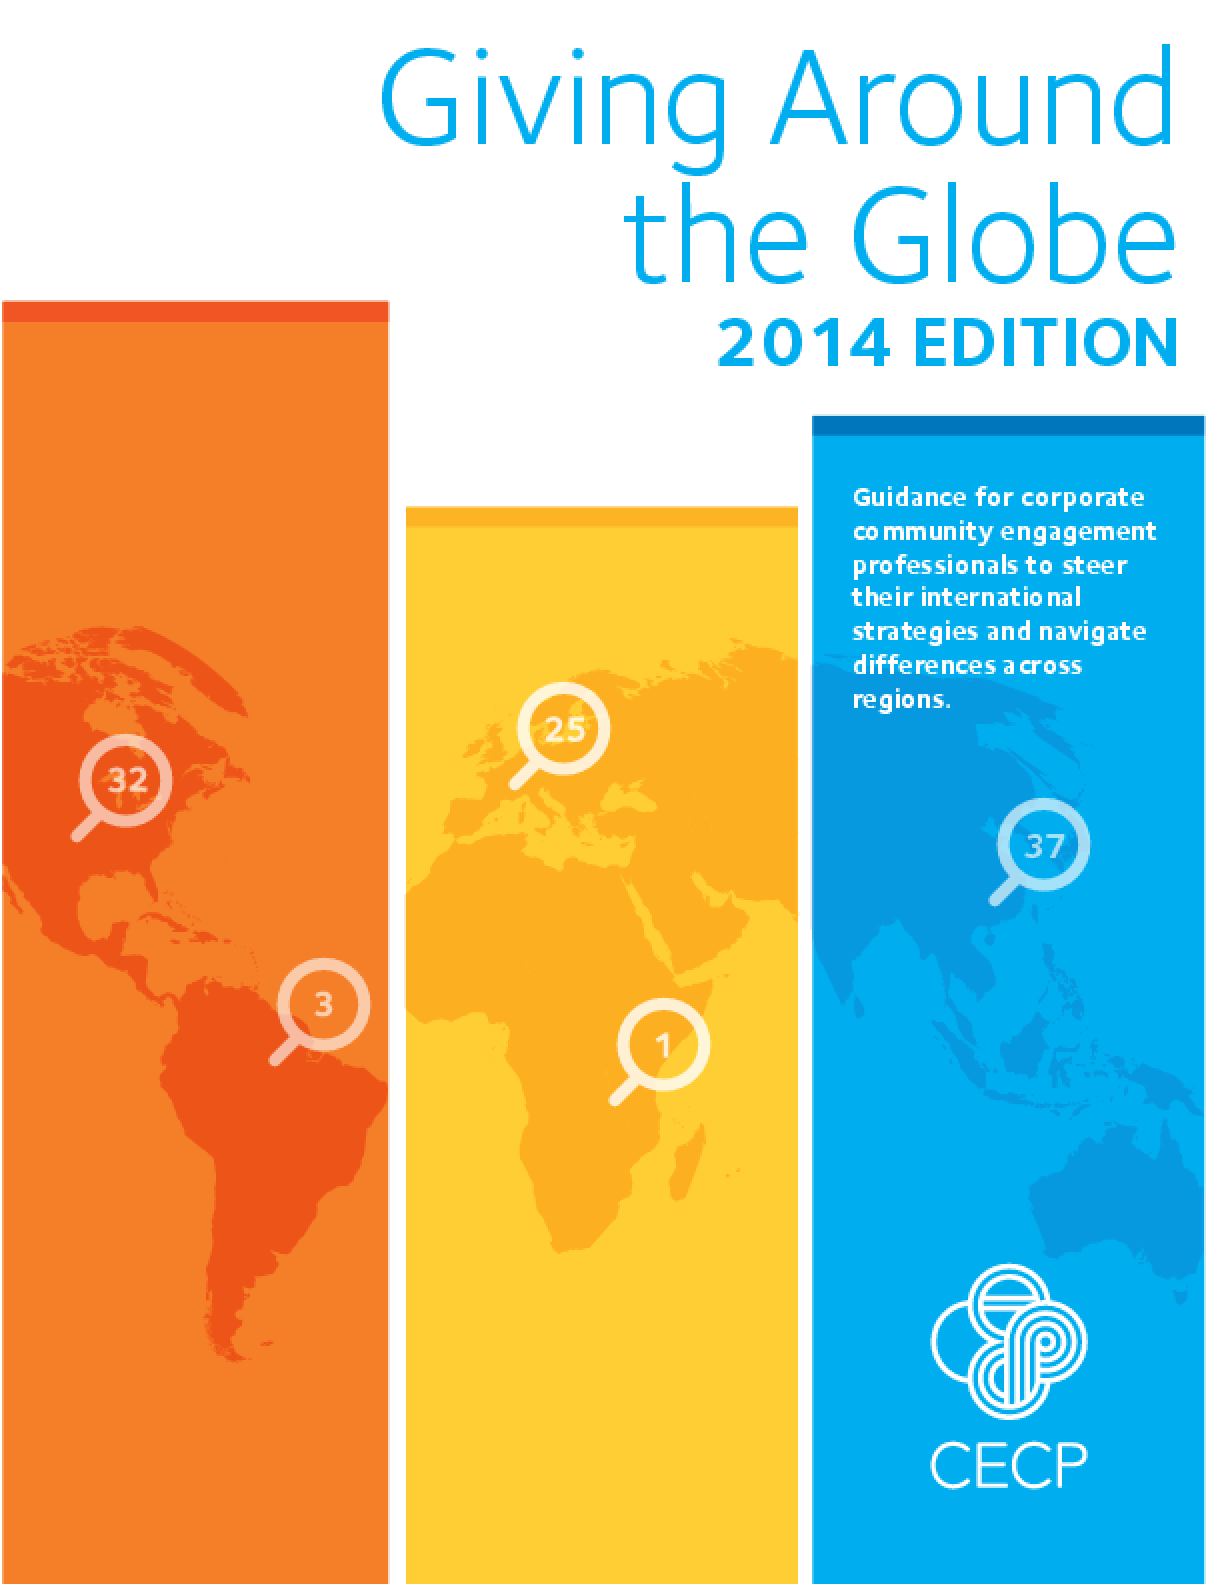 Giving Around the Globe: 2014 Edition